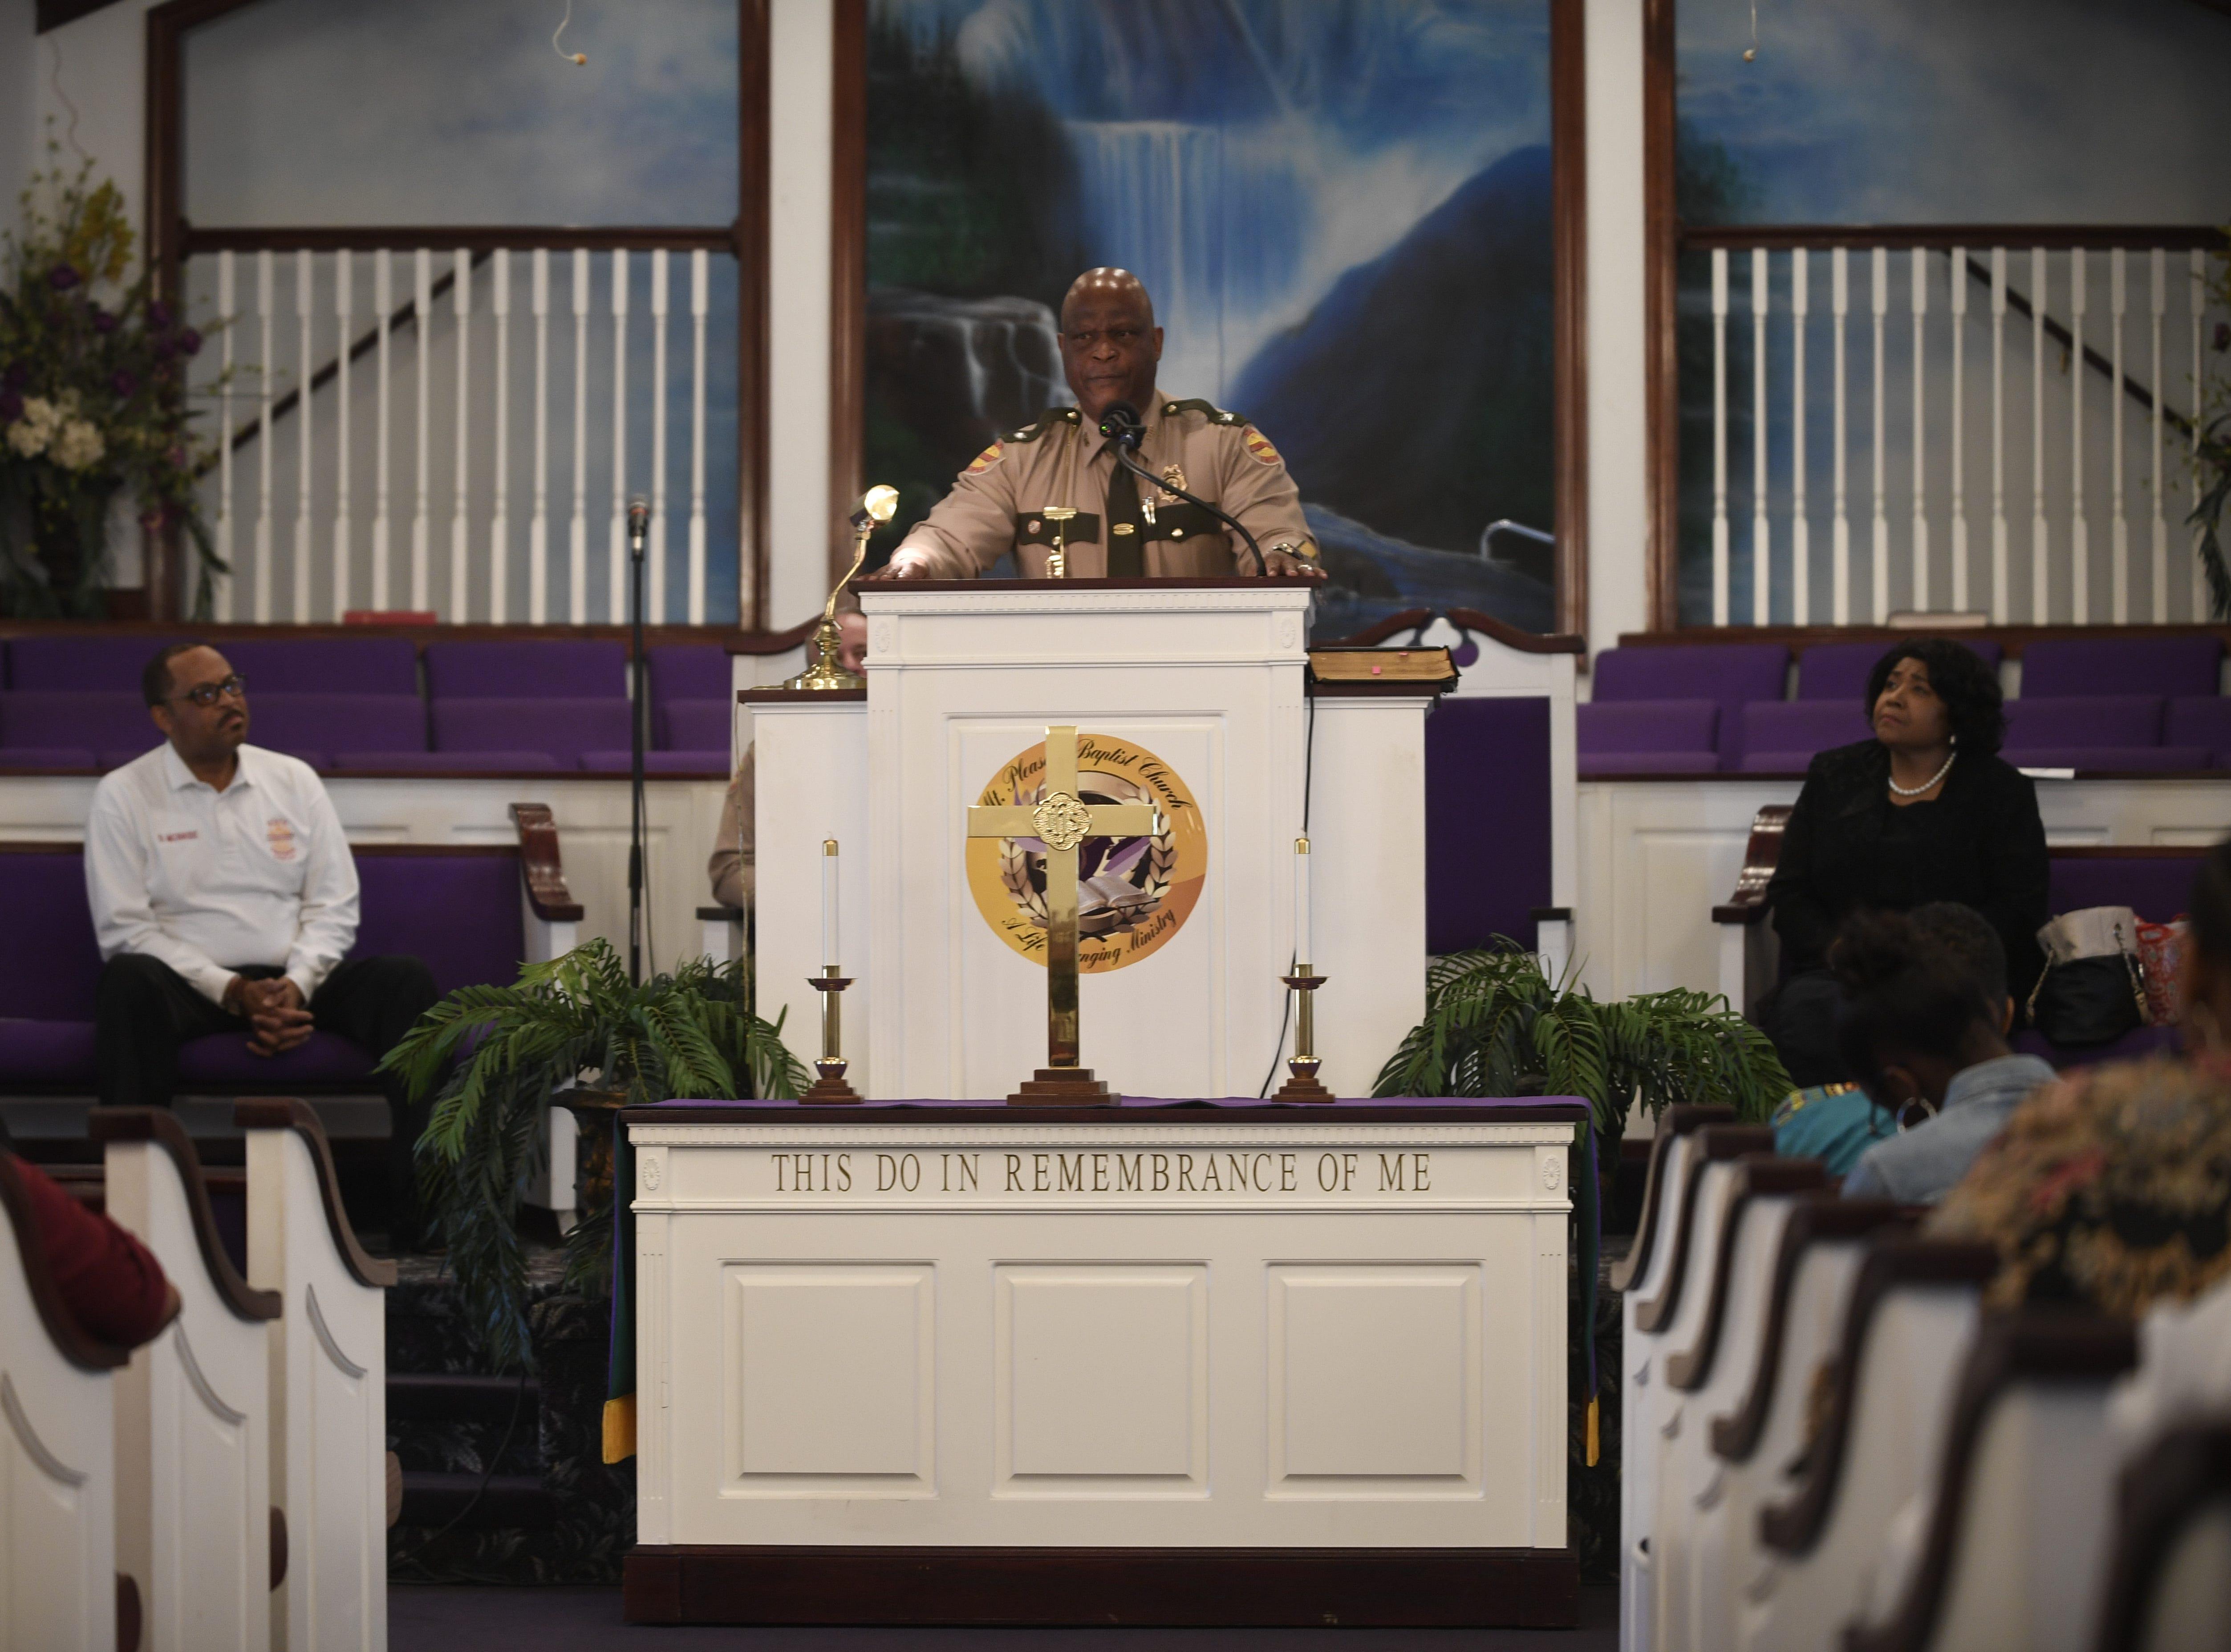 Tennessee Highway Patrol Lt. Col. Tony Barham gives the keynote speech during Mt. Pleasant Baptist Church's Black History Month event Feb. 24, 2019, in Pinson, Tenn.